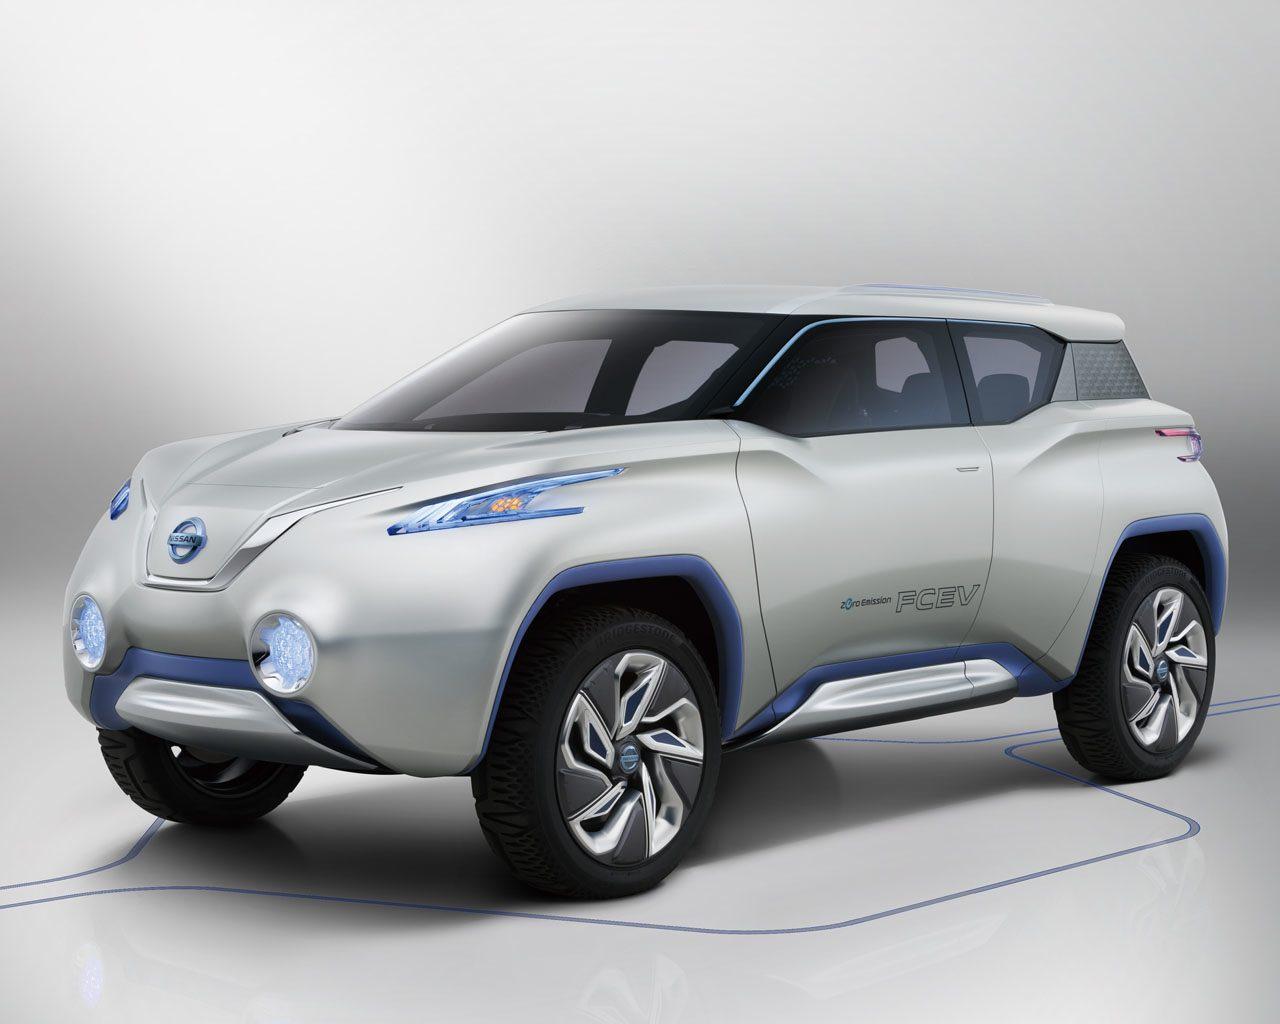 Nissan is ready for hydrogen